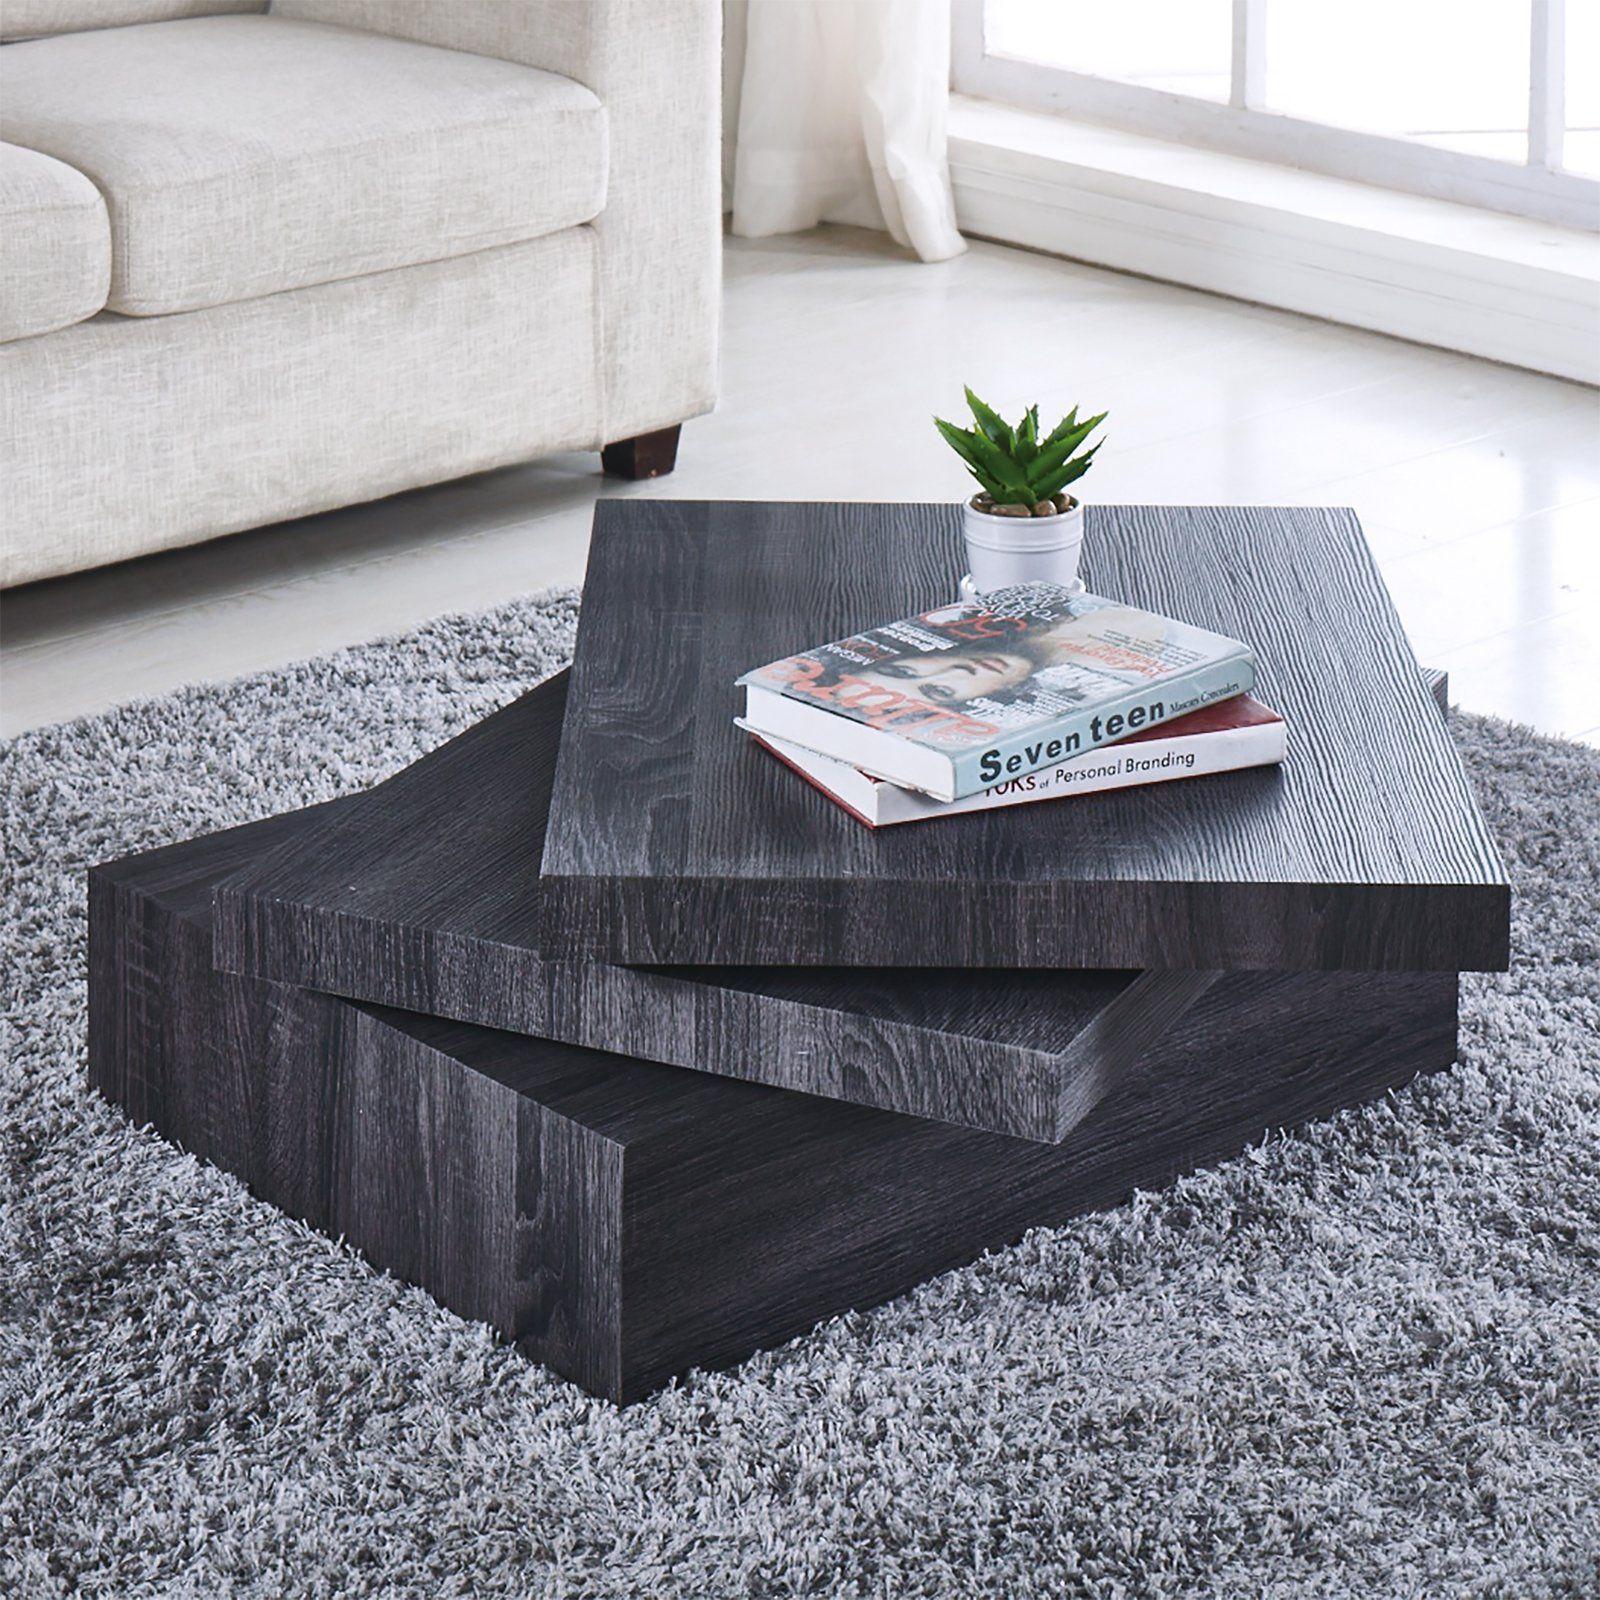 Newretailglobal Black Coffee Table Oak Square Rotating C Contemporary Modern Living Room Furniture Modern Furniture Living Room Modern Contemporary Living Room [ 1600 x 1600 Pixel ]